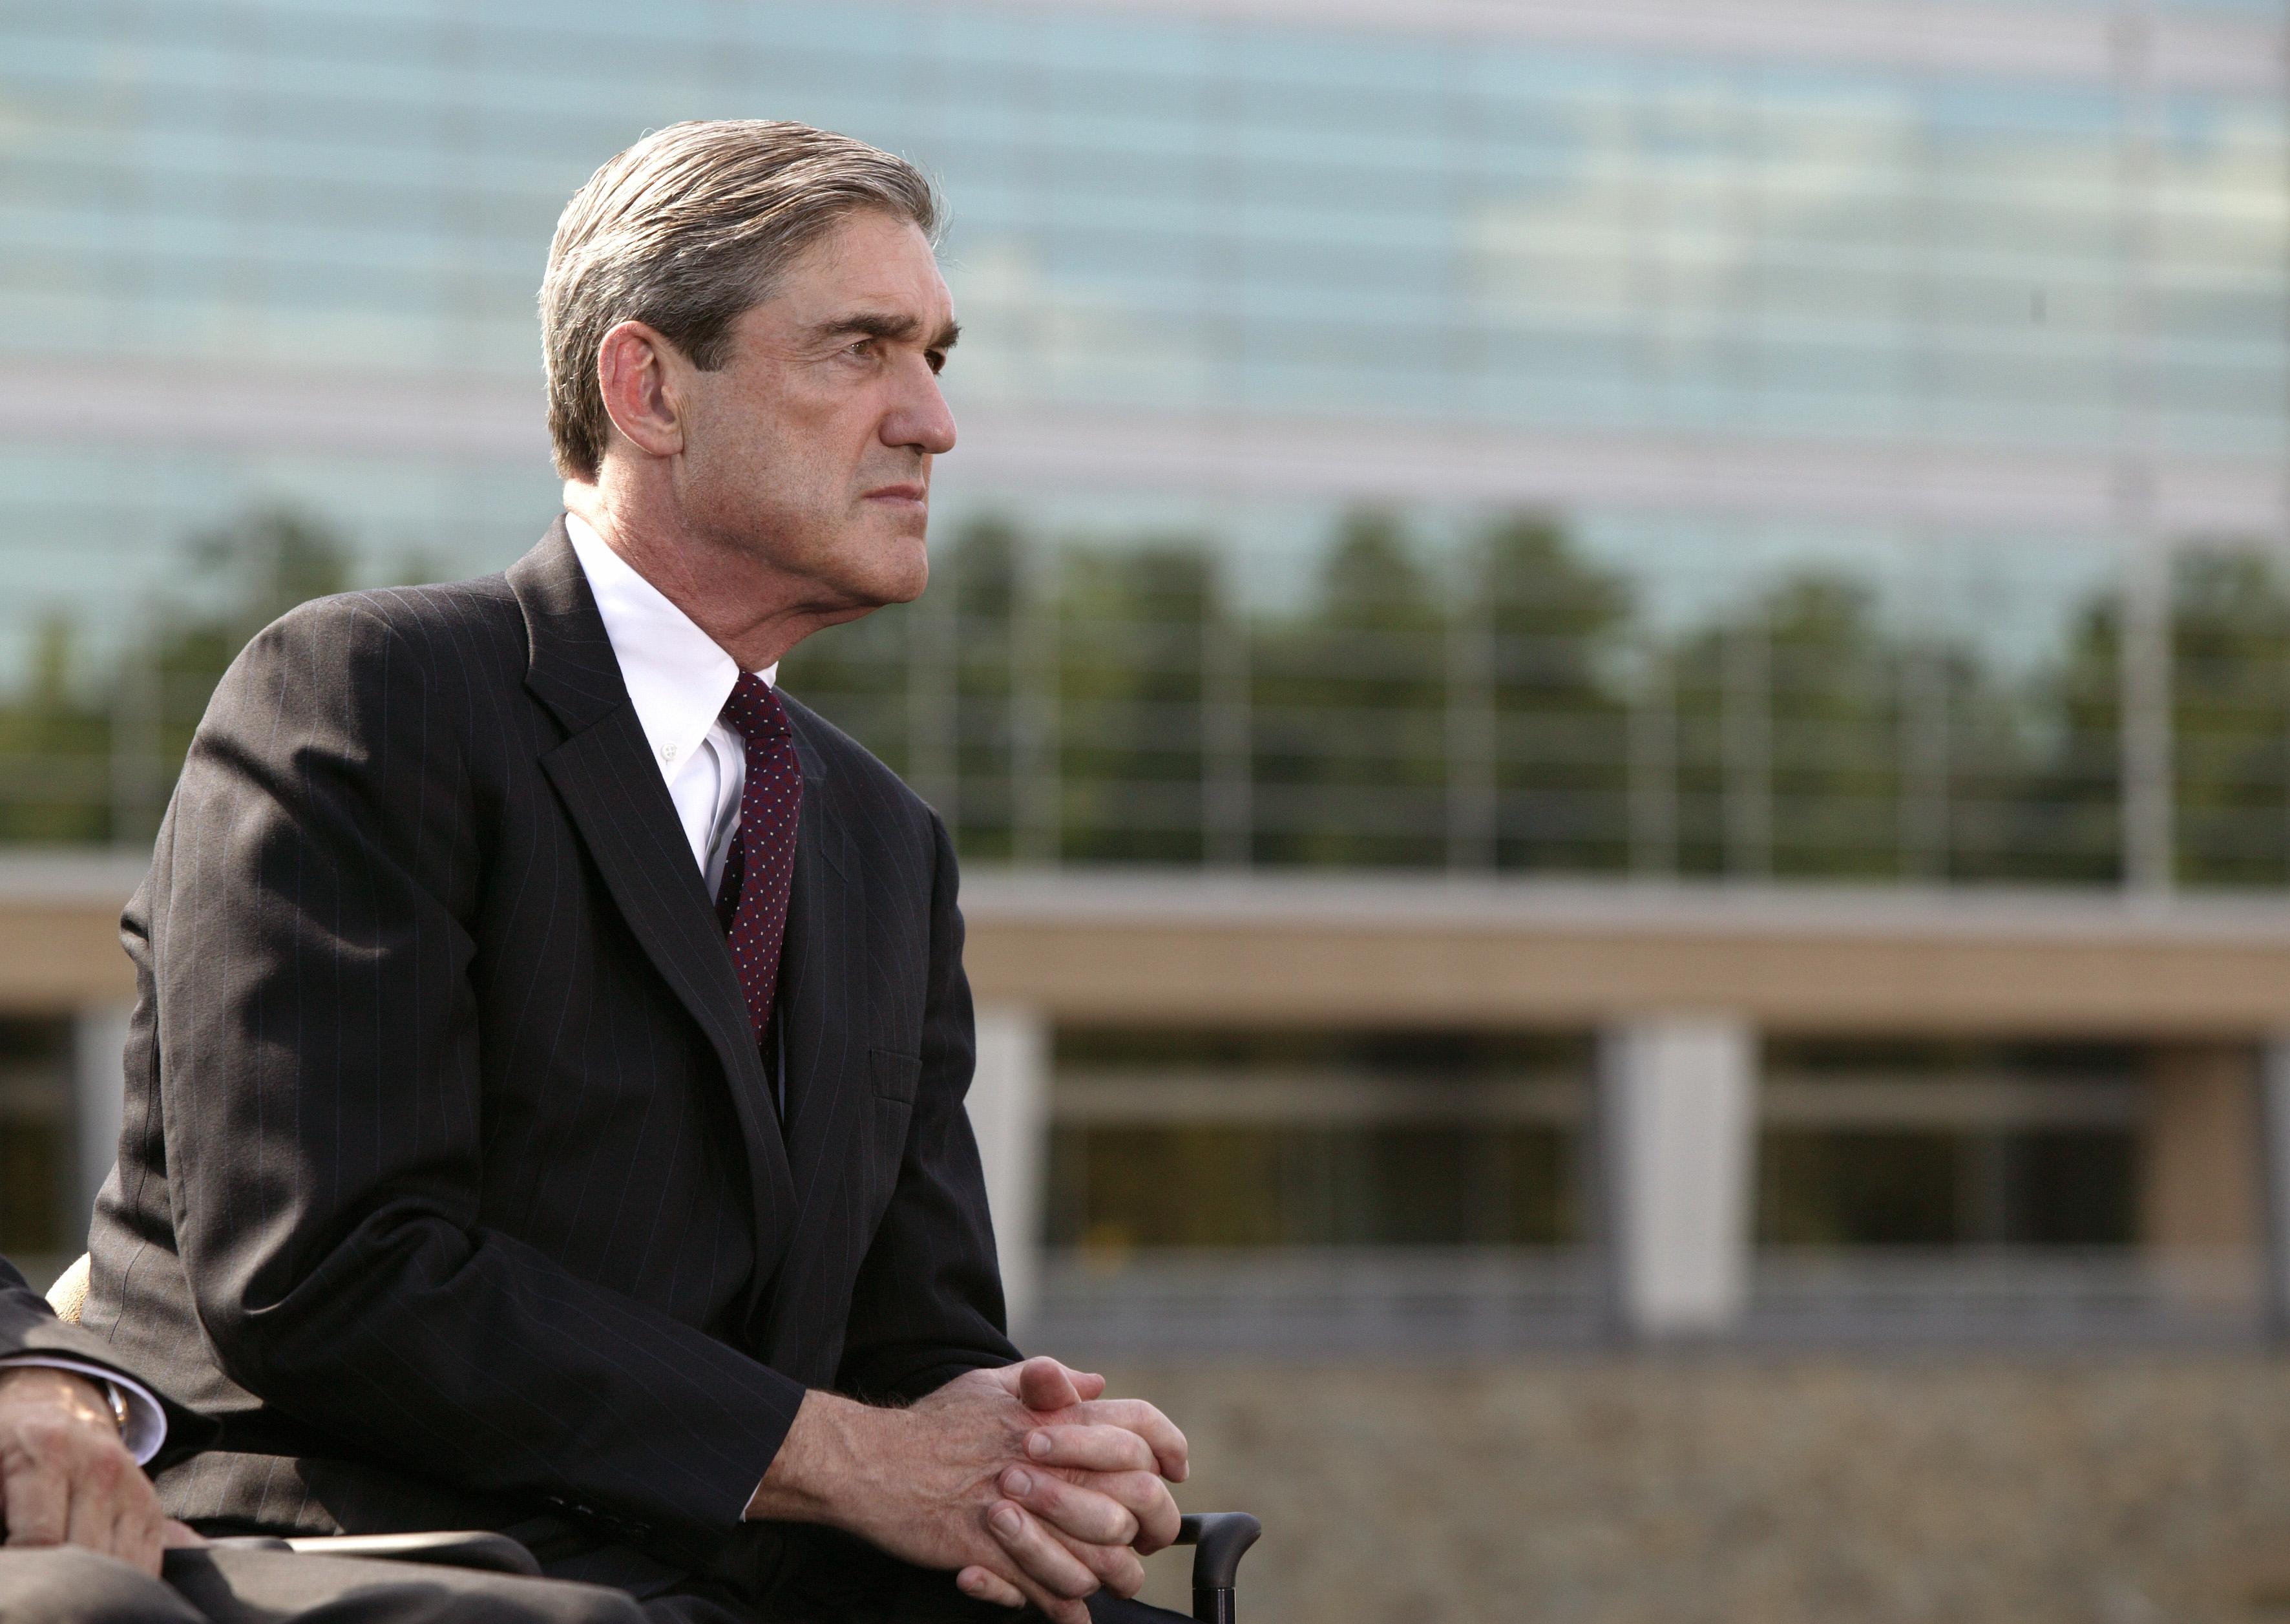 A picture of Robert Mueller